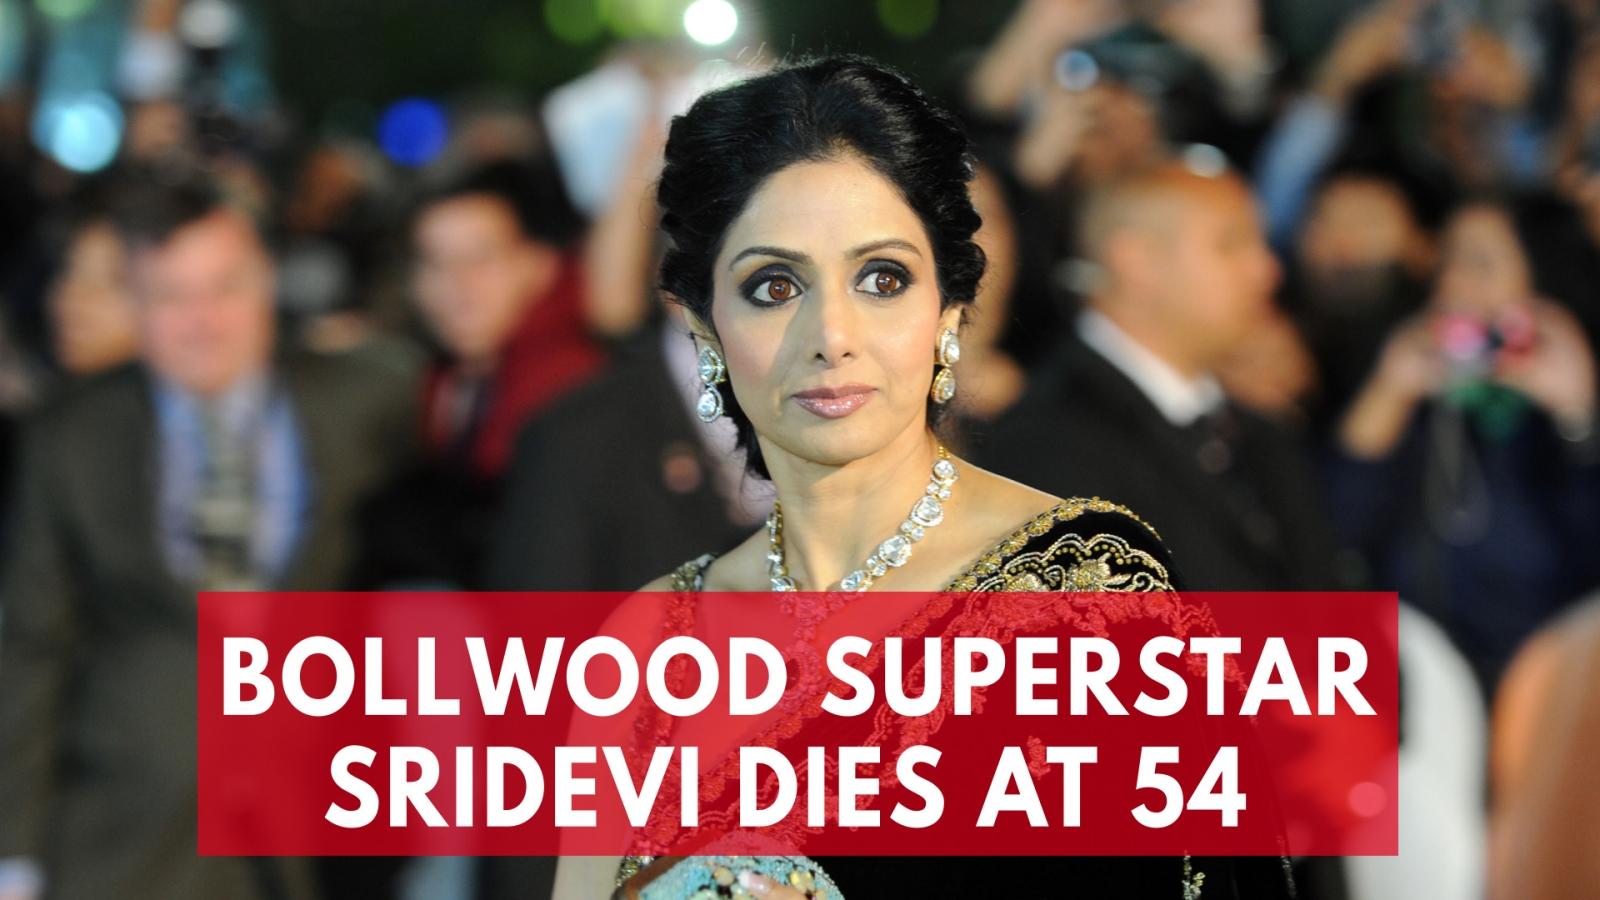 bollowoods-first-female-superstar-sridevi-kapoor-dies-at-54